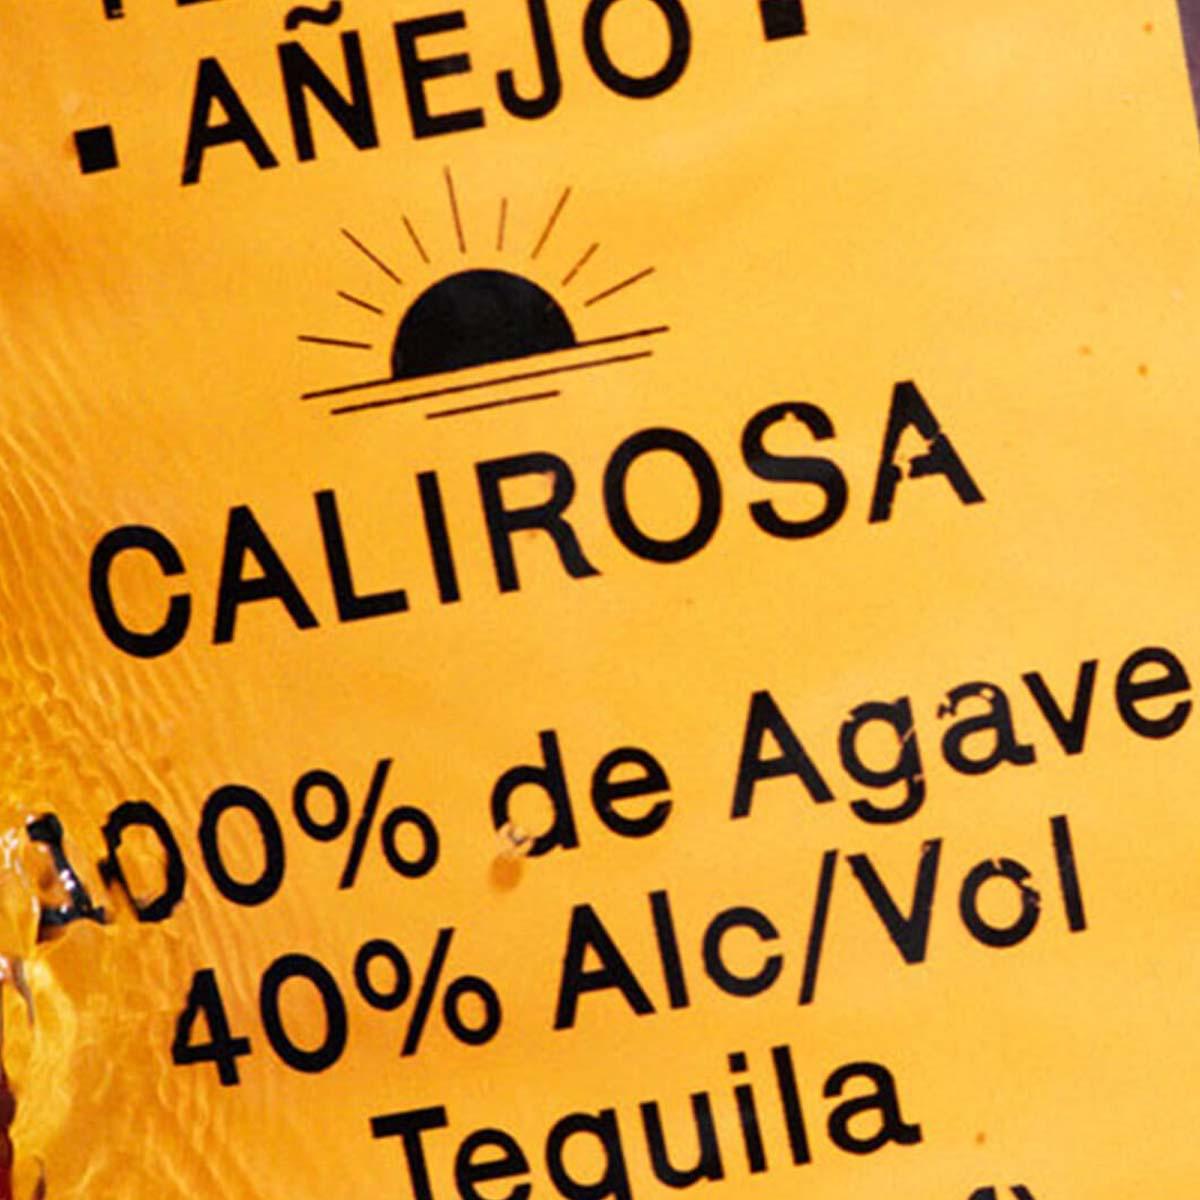 Calirosa Añejo Tequila